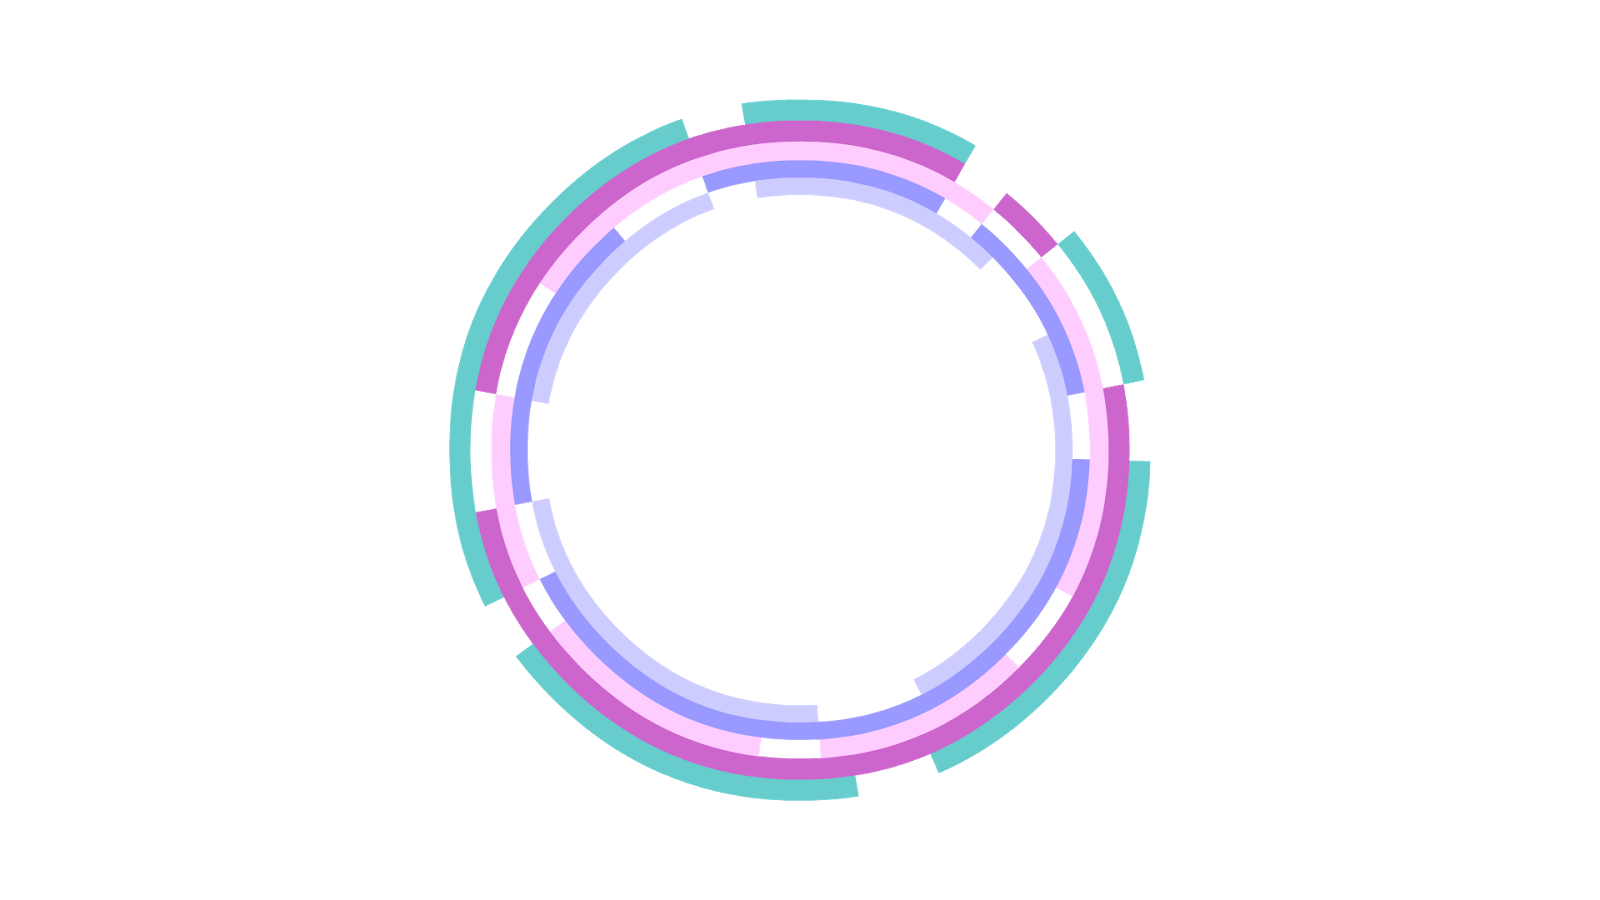 Baru 29+ Logo Lingkaran Keren Png